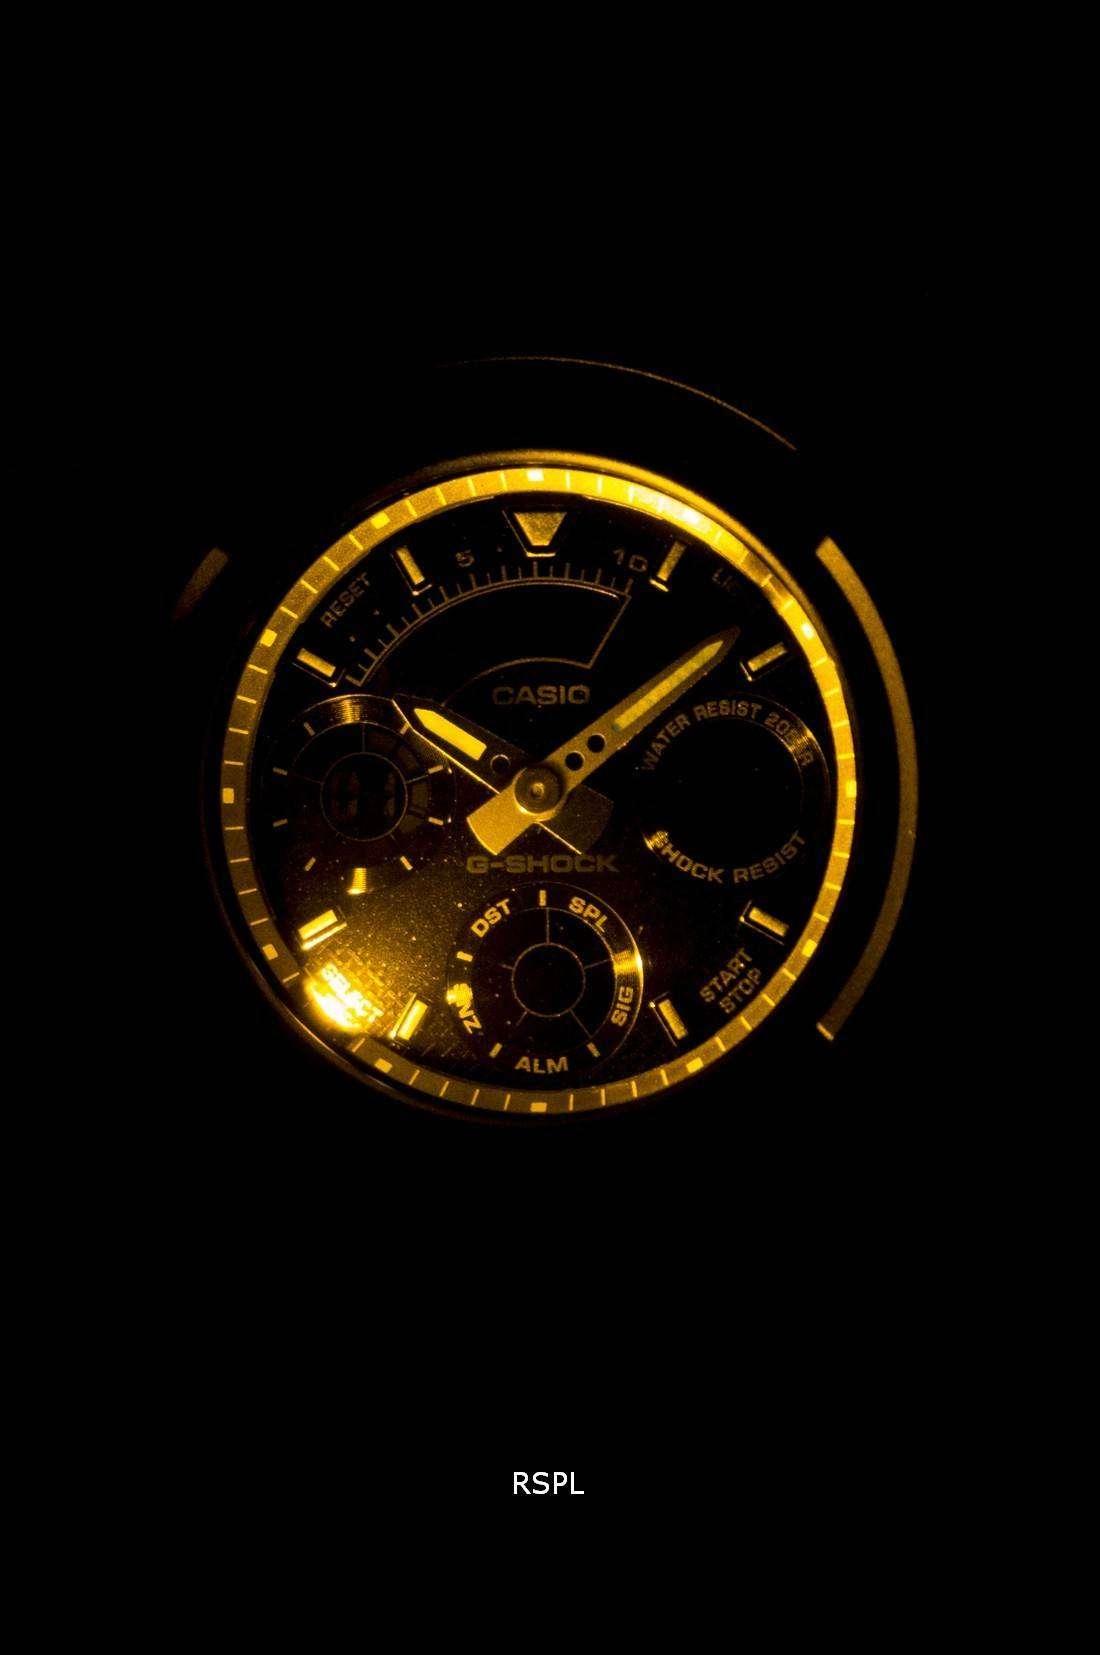 Casio G-shock Analog-Digital World Time Watch AW591-2ADR AW591-2A Mens Watch